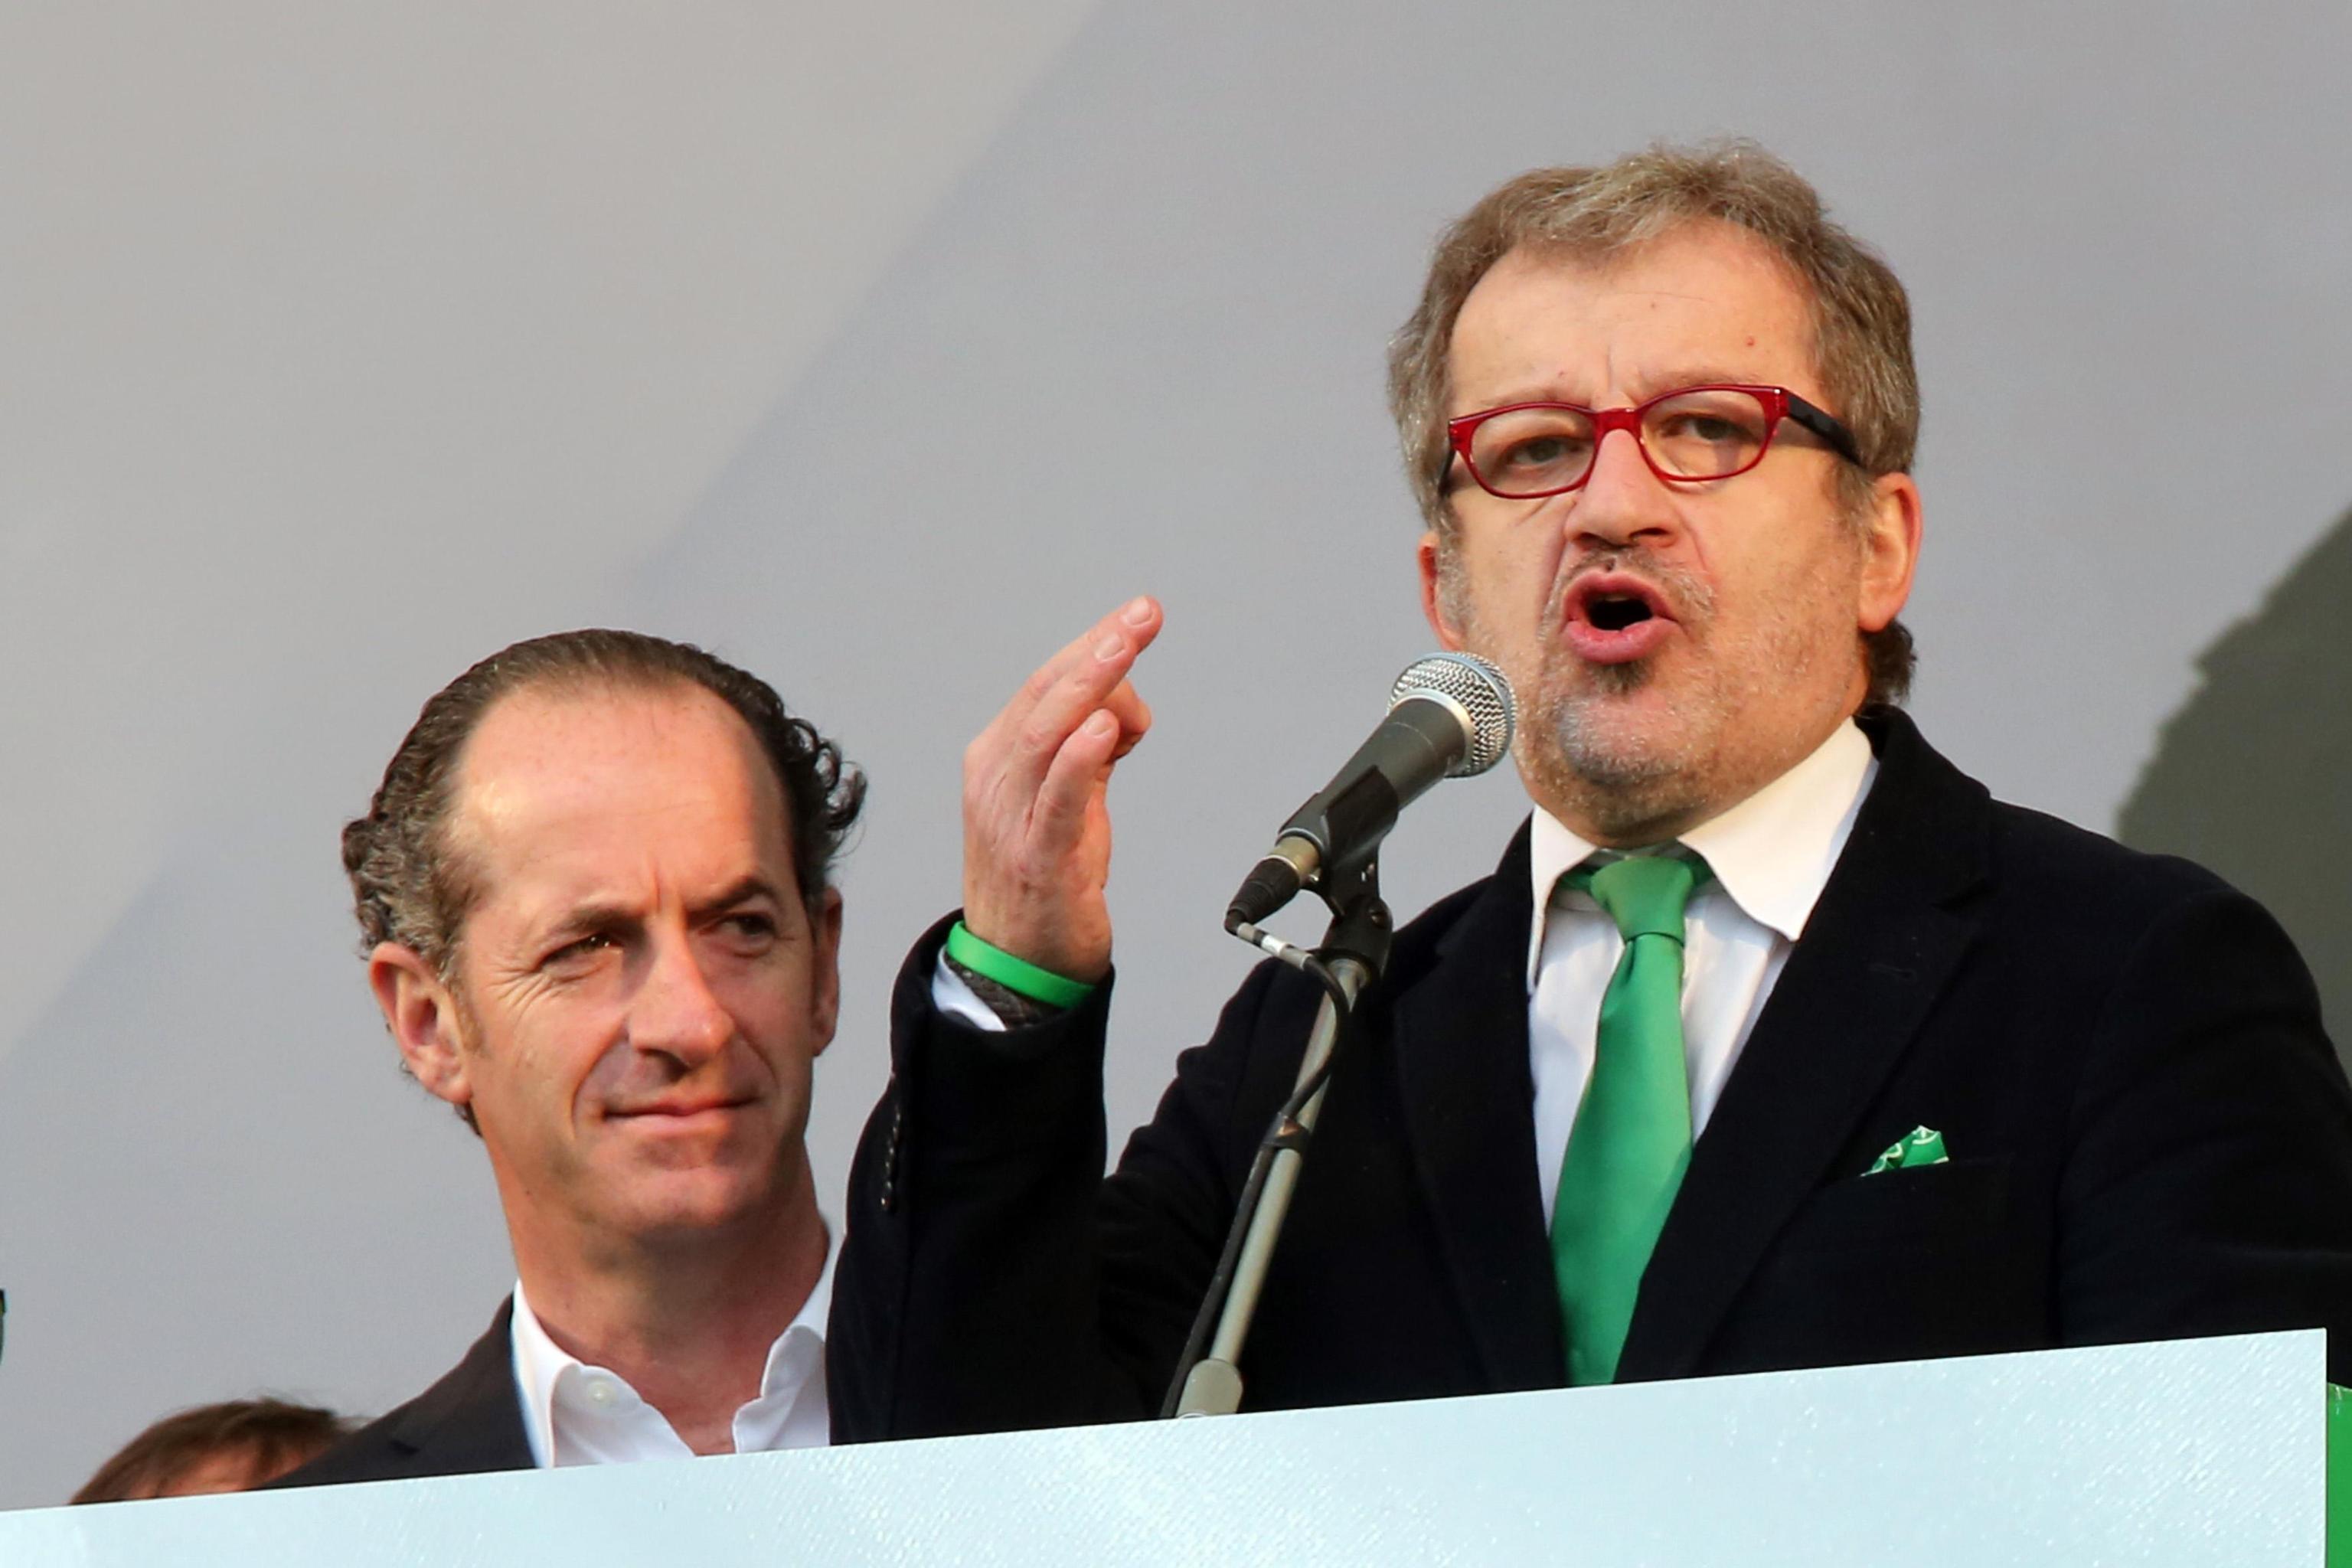 Referendum autonomia Lombardia e Veneto, risultati e affluenza